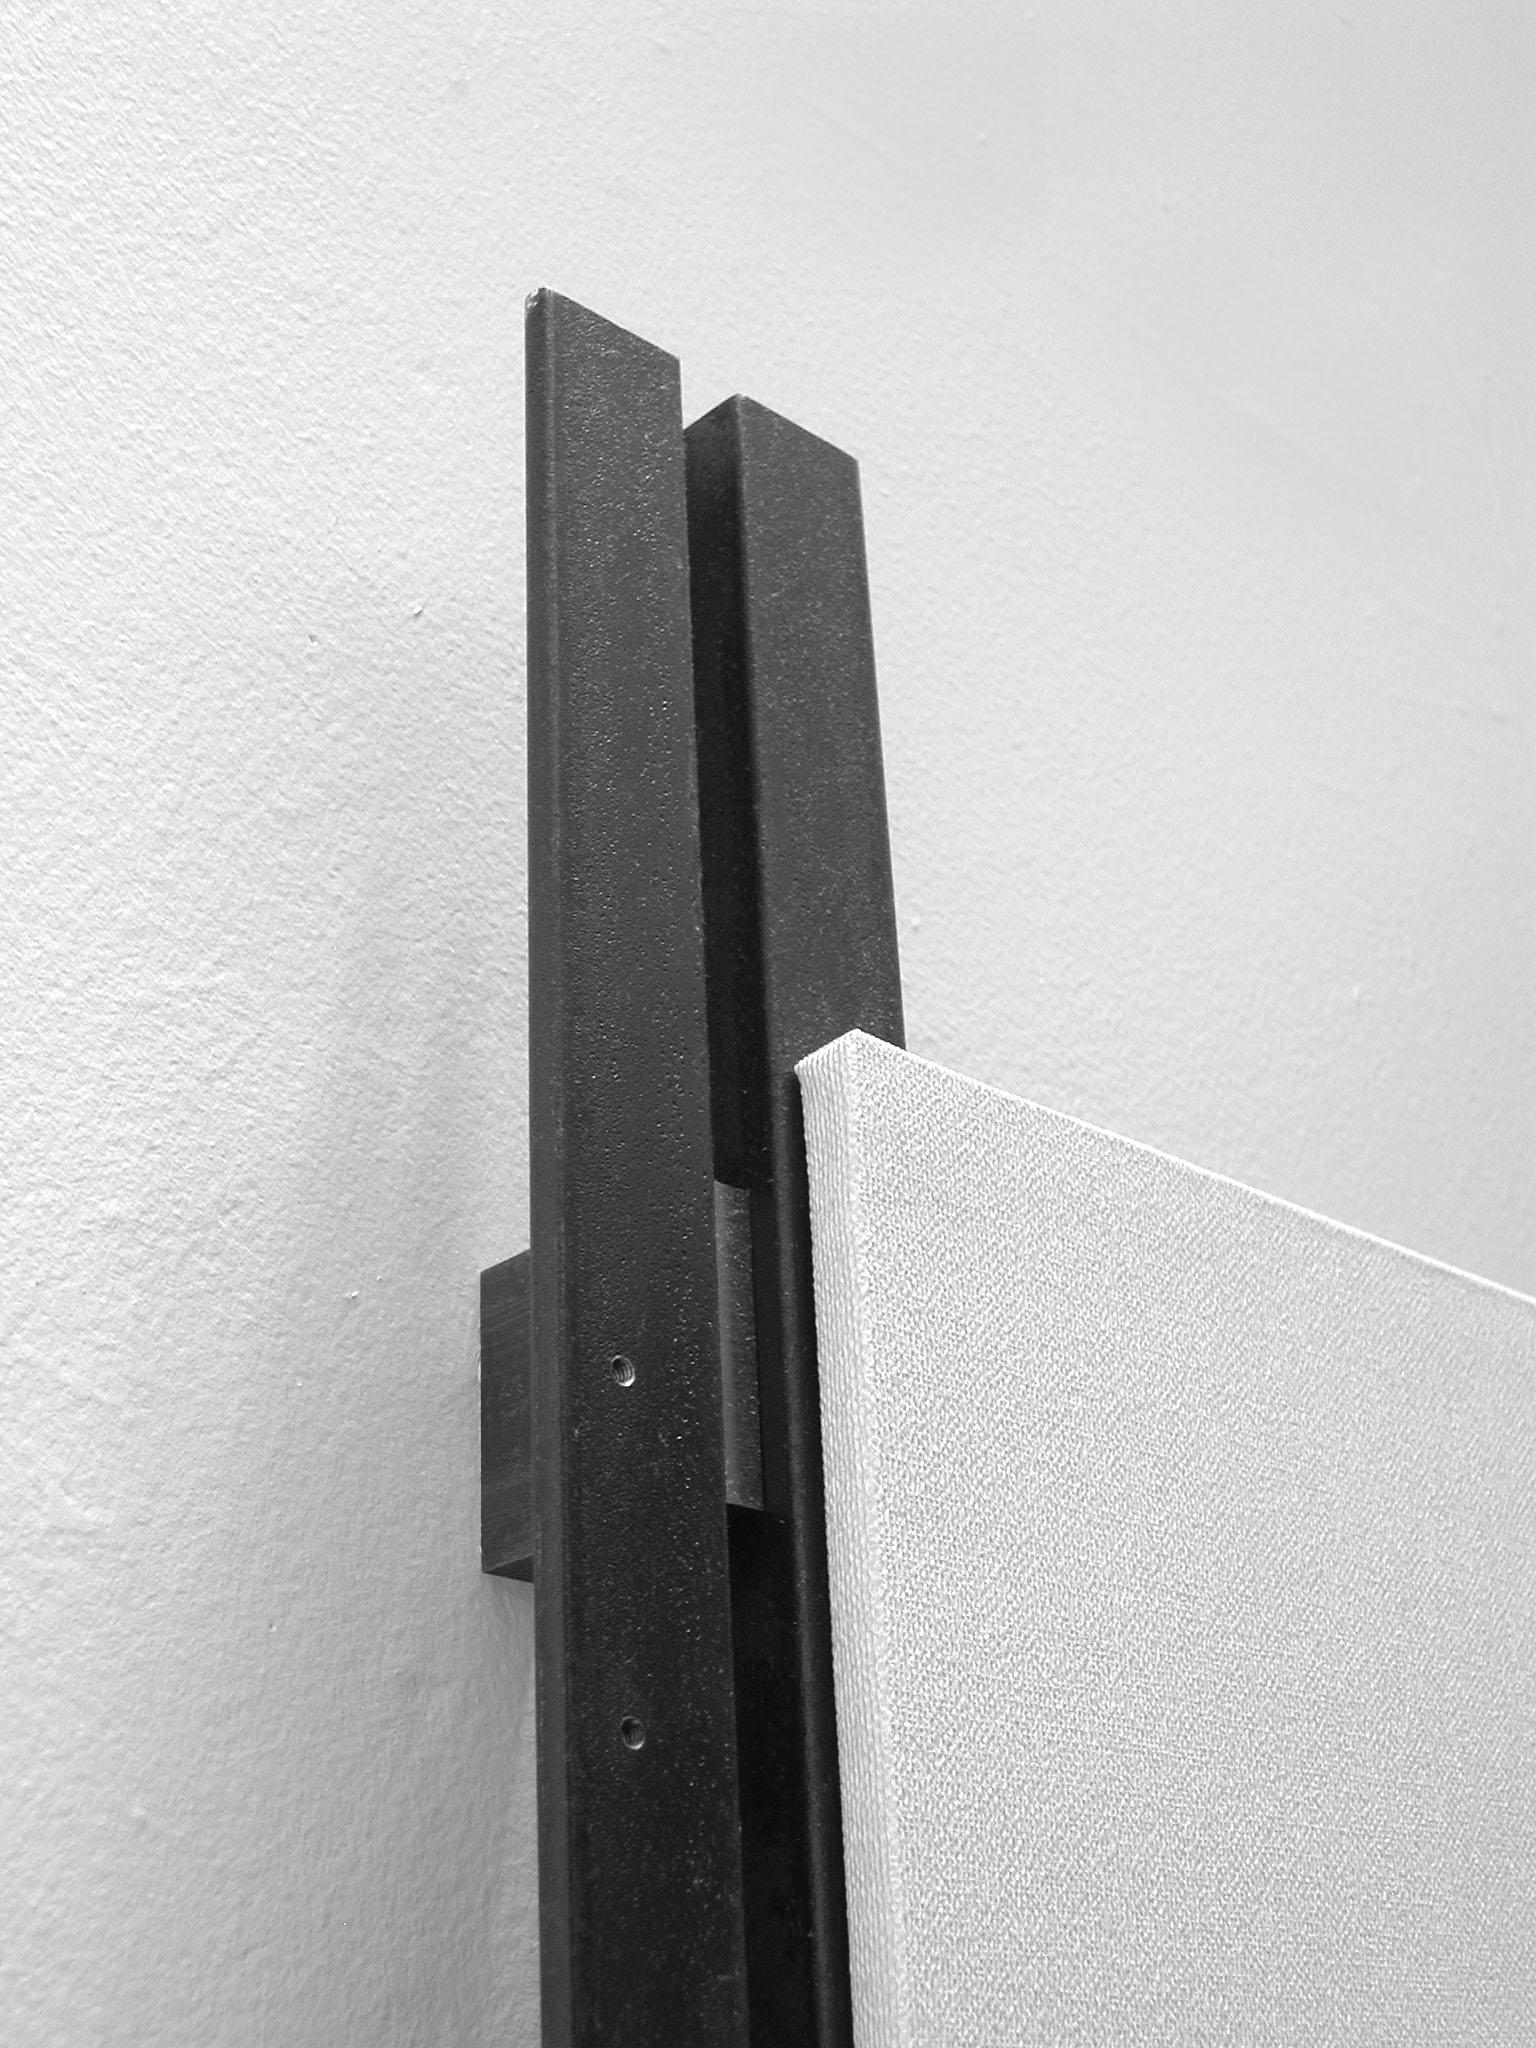 Detail - Upper Left Corner. Tab Between Vertical Rails